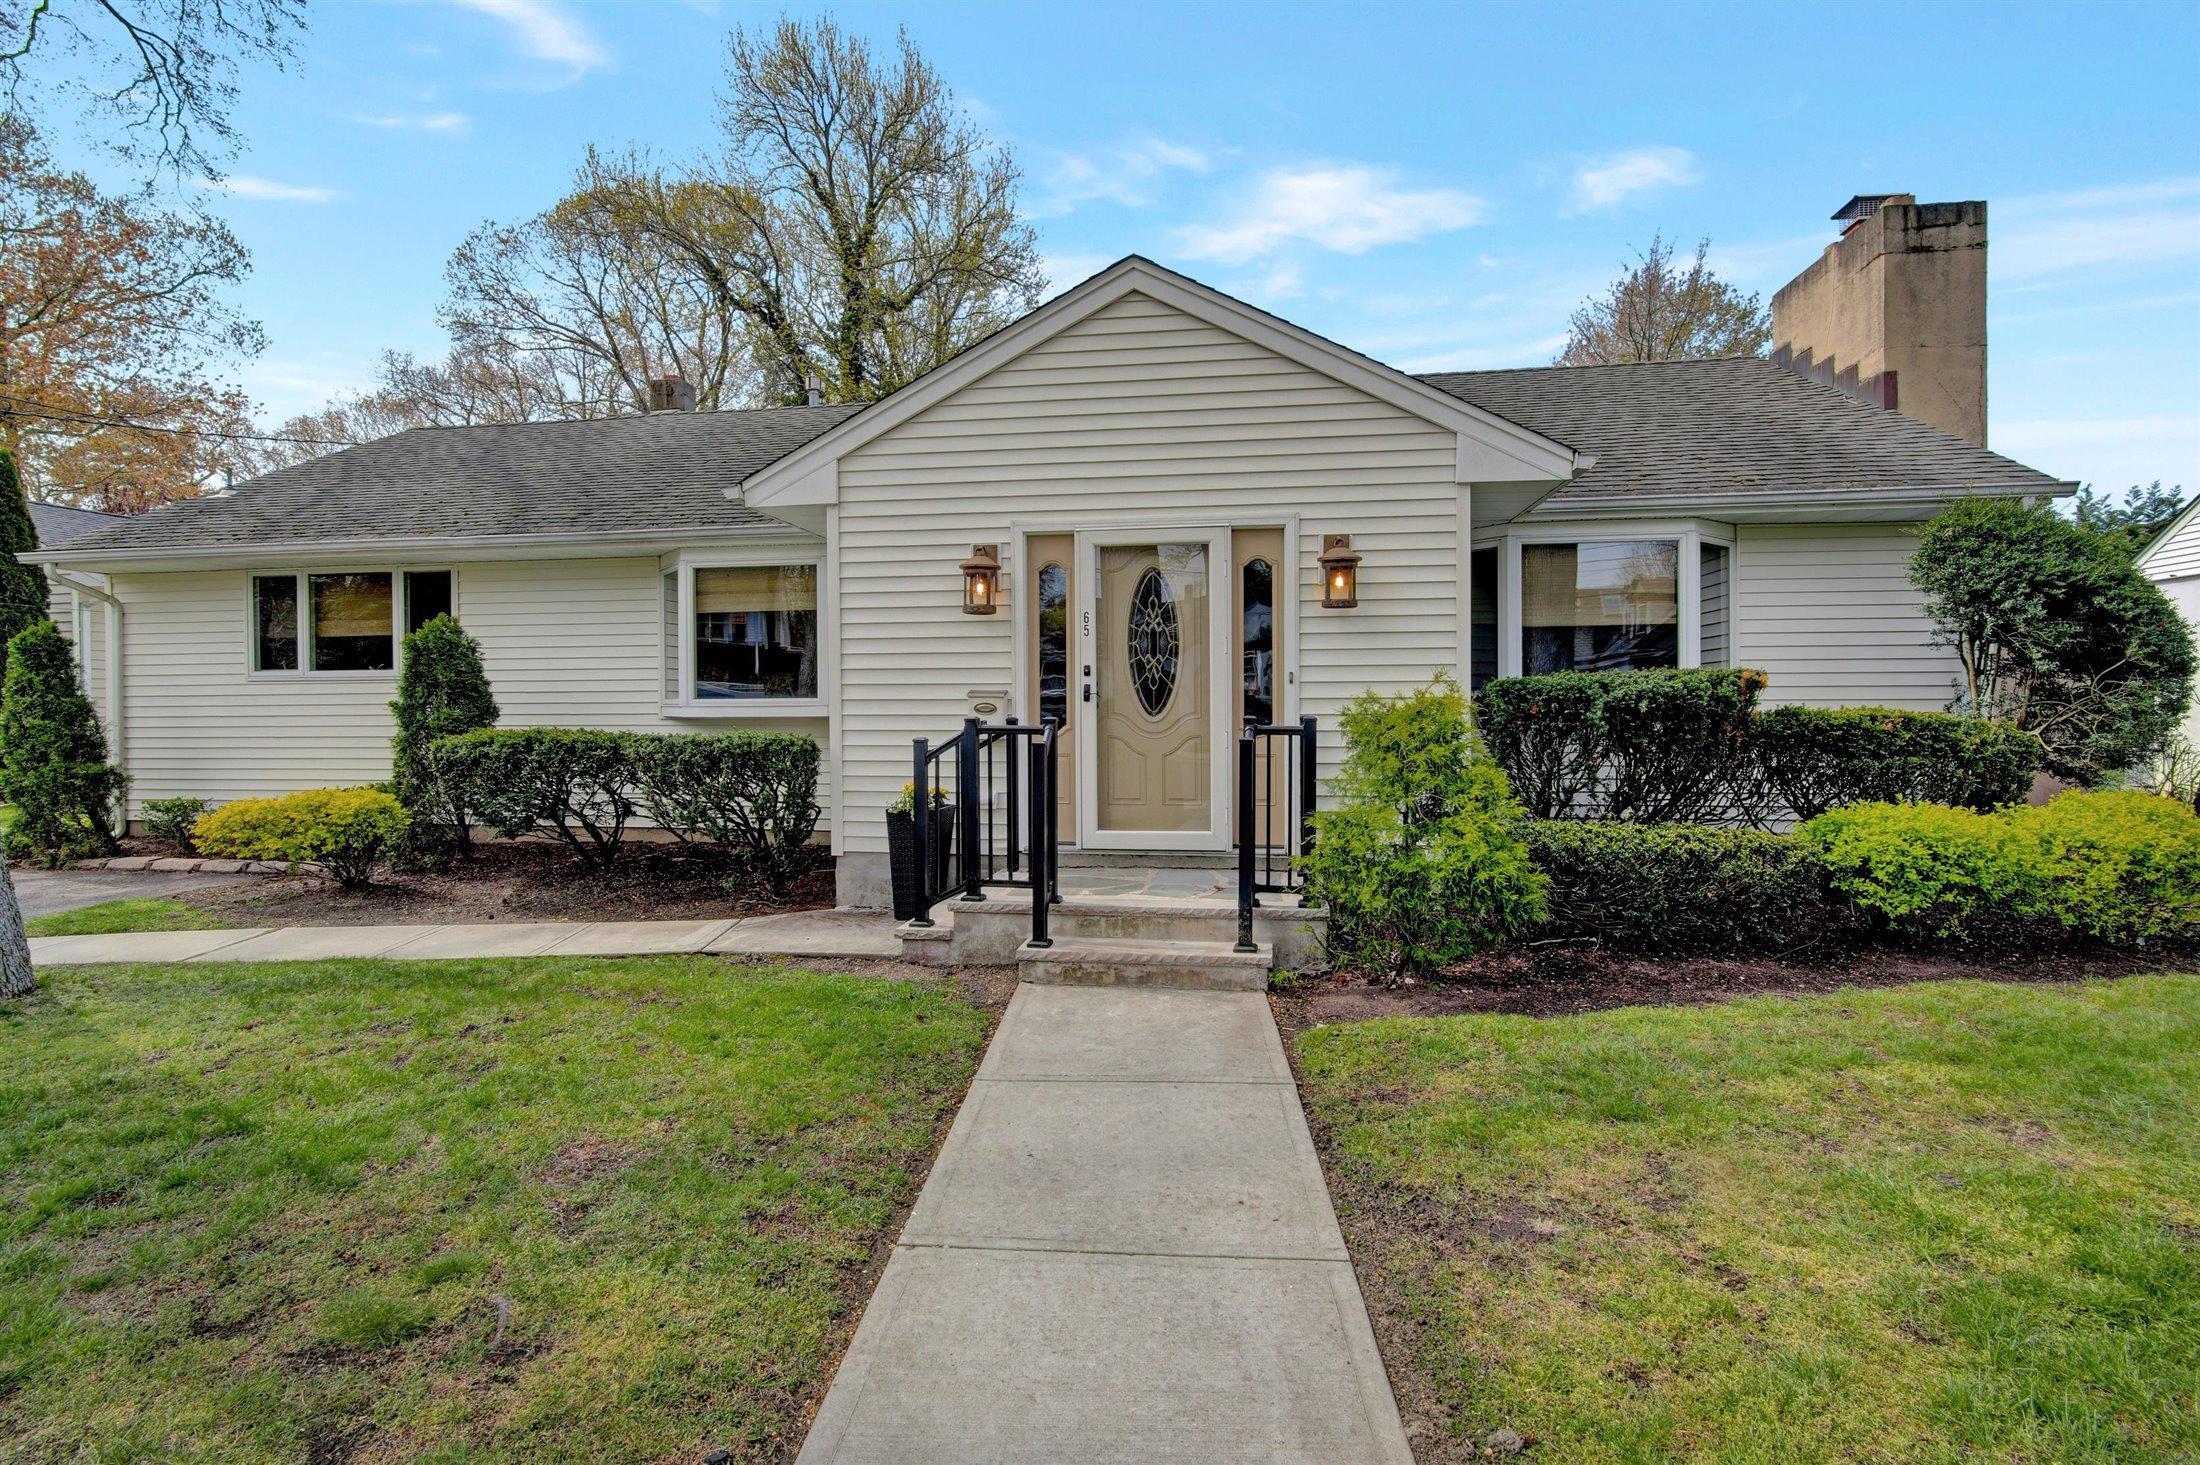 65 Deal Lake Point Road, Ocean Twp, New Jersey 07712, 3 Bedrooms Bedrooms, ,2 BathroomsBathrooms,Single Family,For Sale,65 Deal Lake Point Road,1,22112892